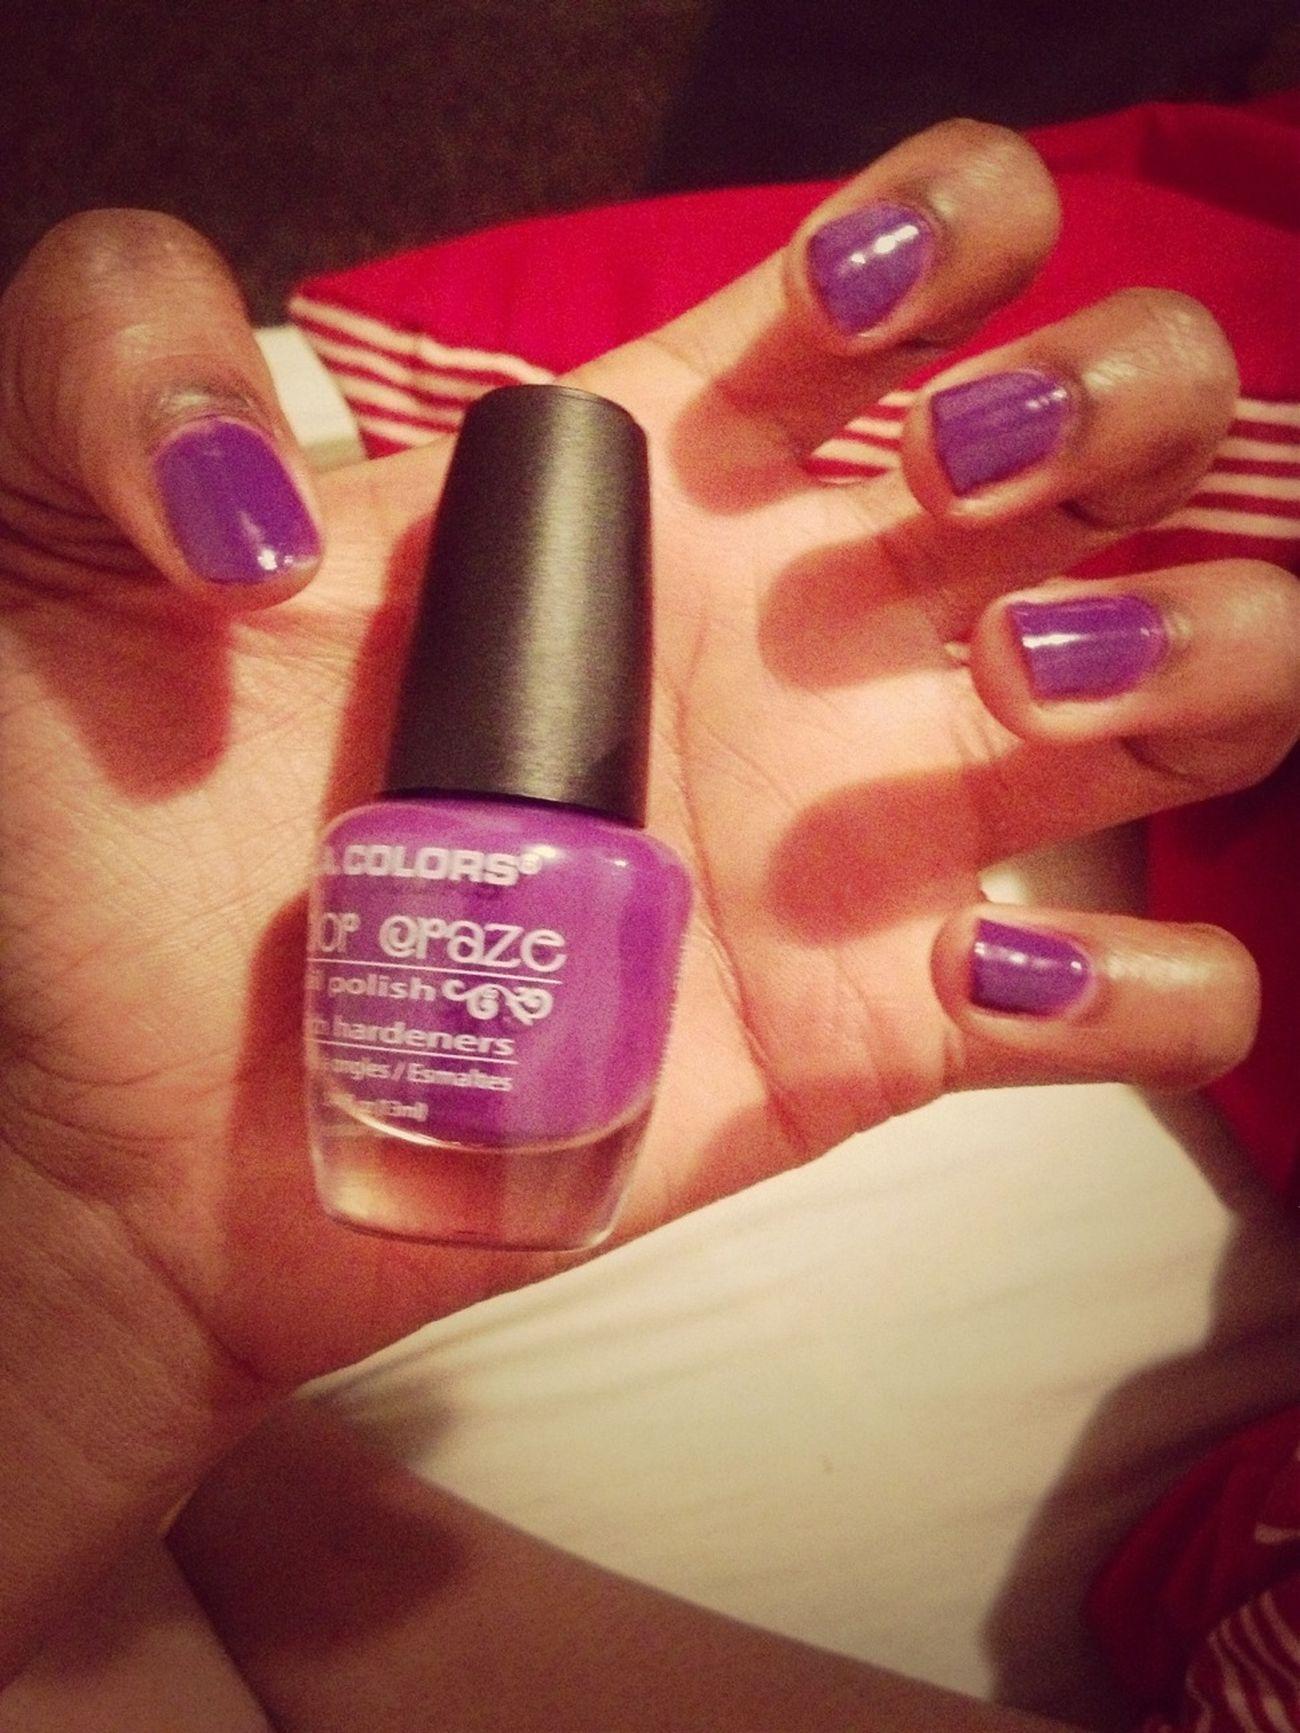 Polishing My Nails